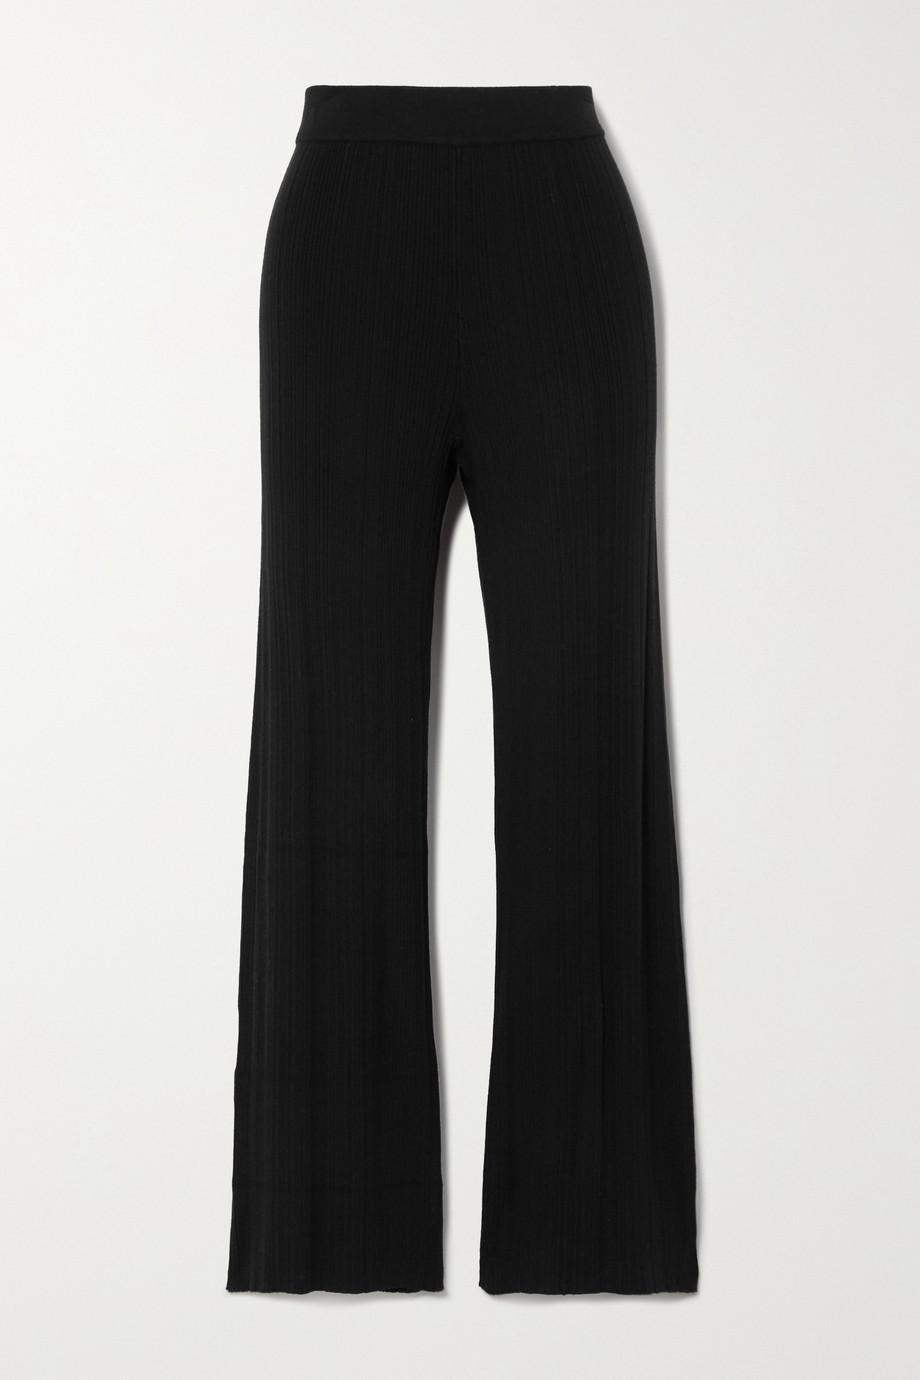 Ninety Percent Ribbed Tencel-blend straight-leg pants